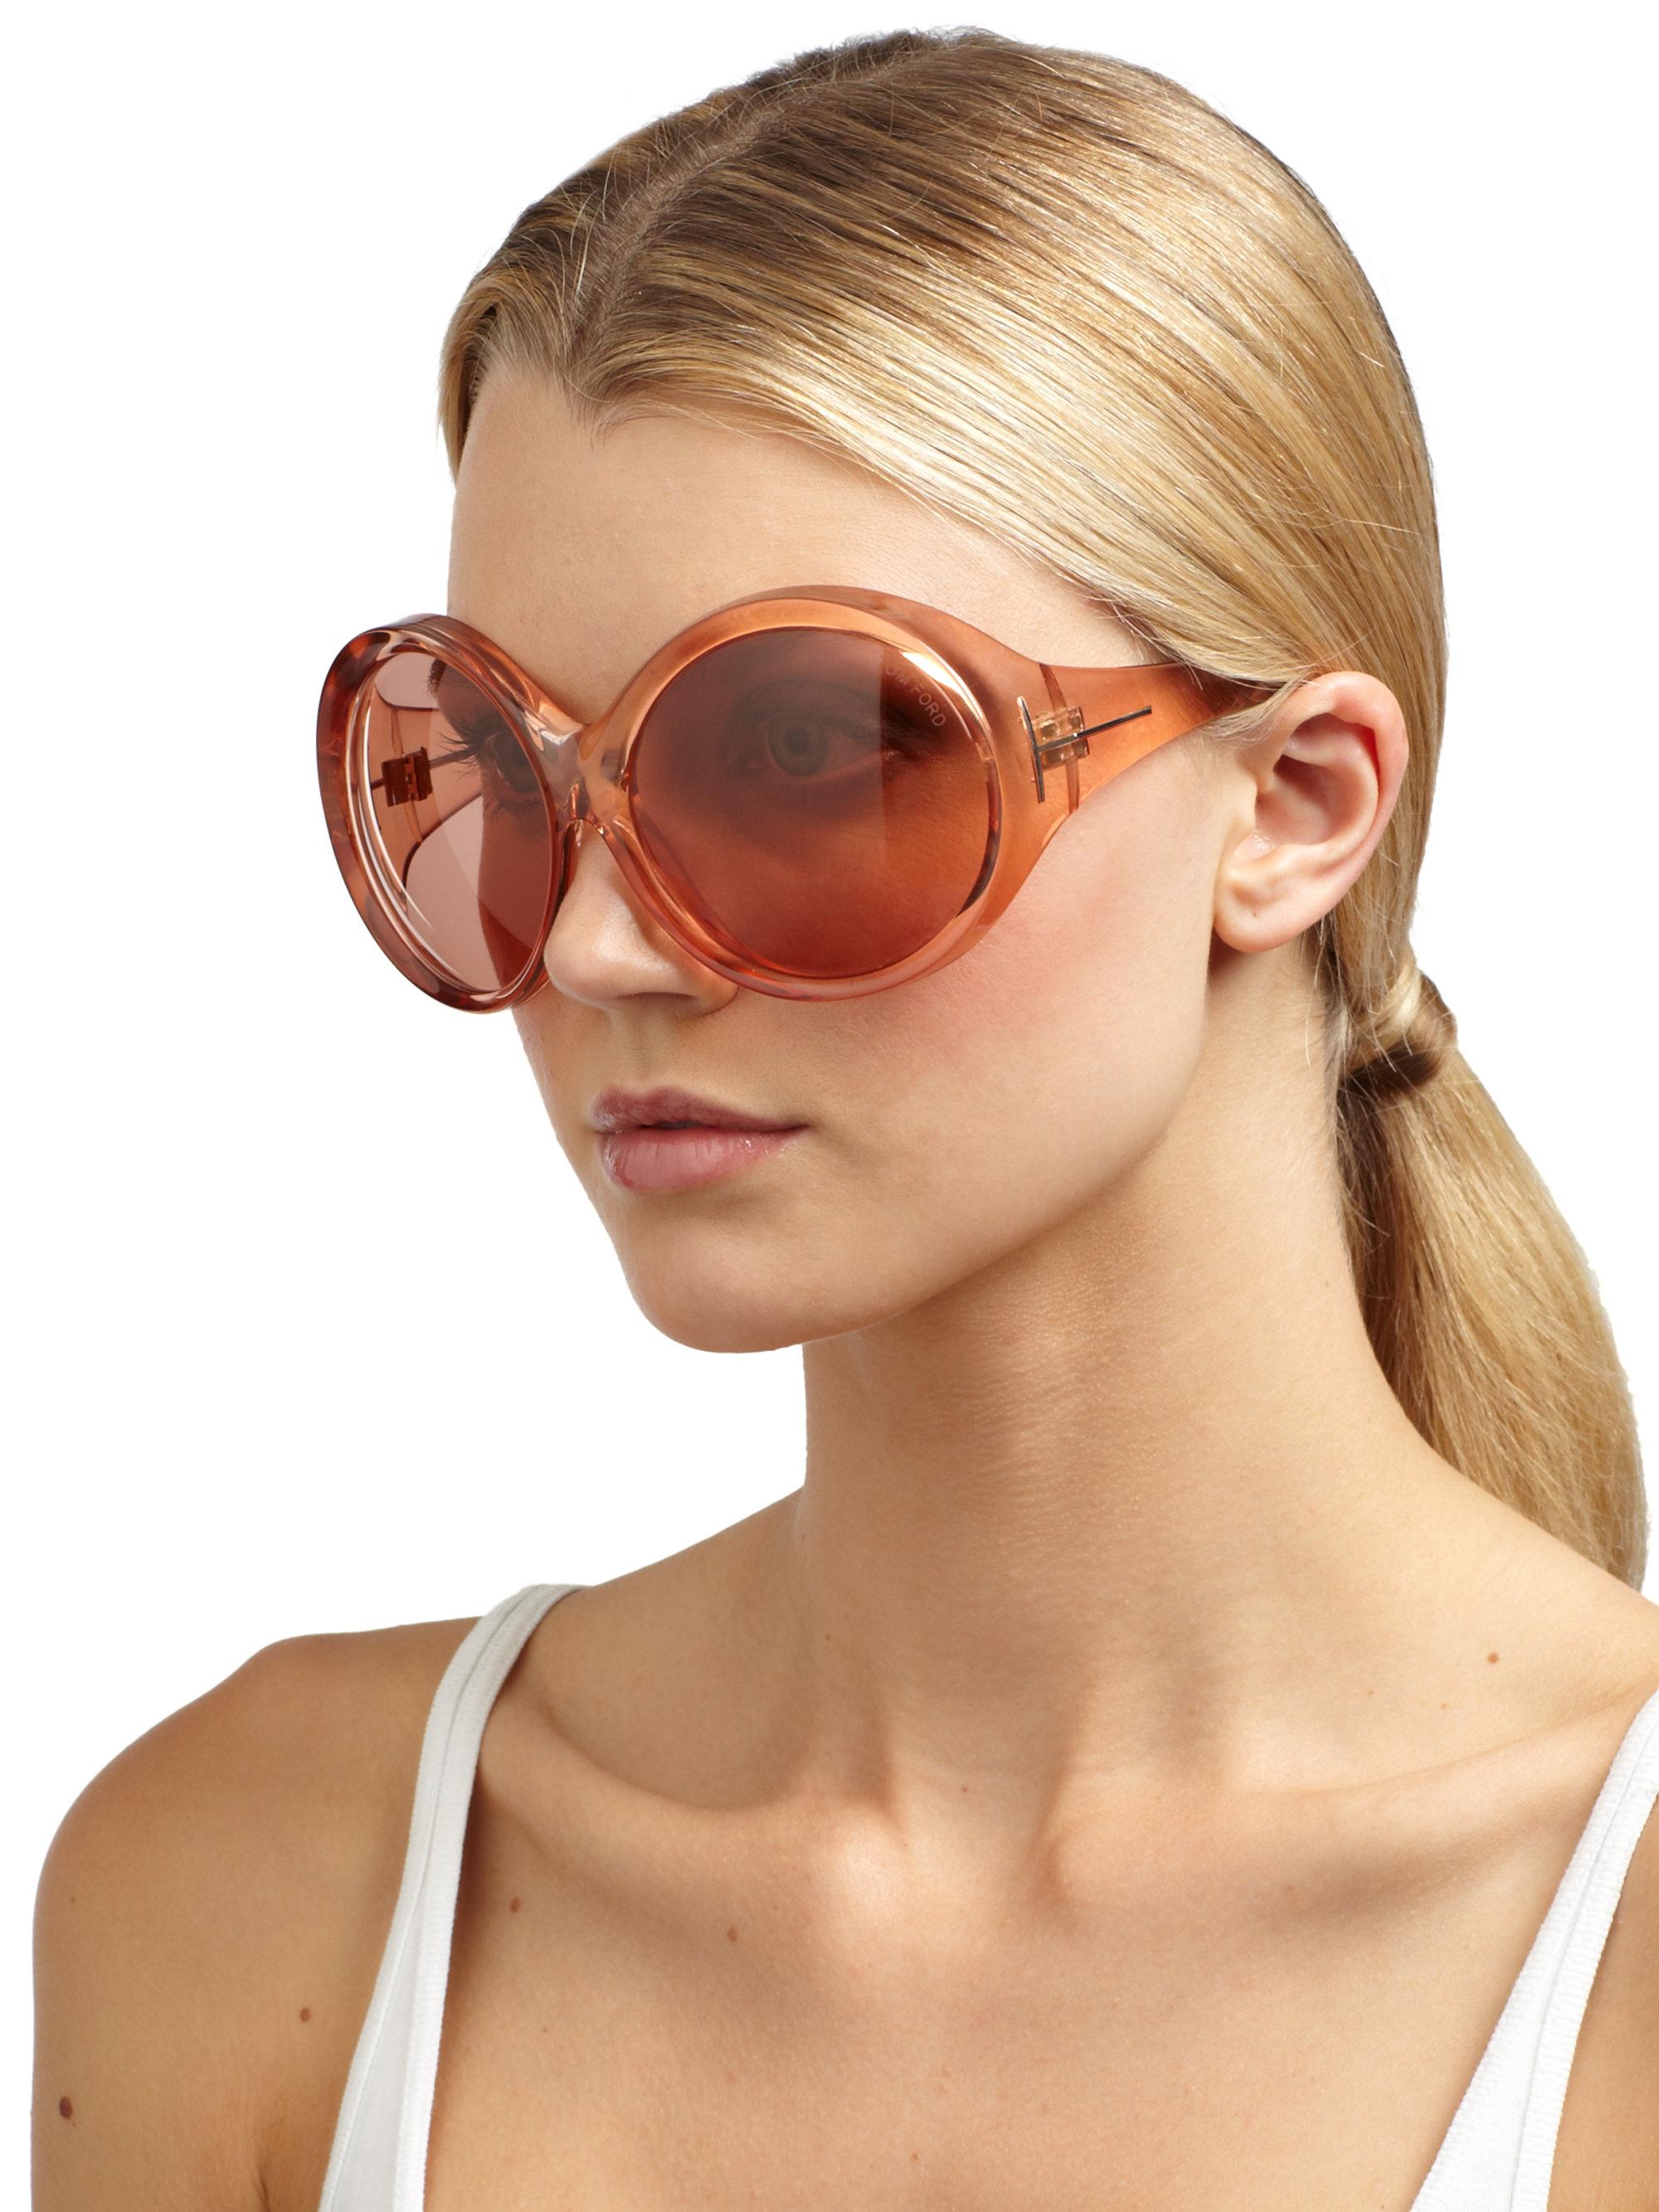 cdeff79f8f Tom Ford Ali Sunglasses in Pink - Lyst